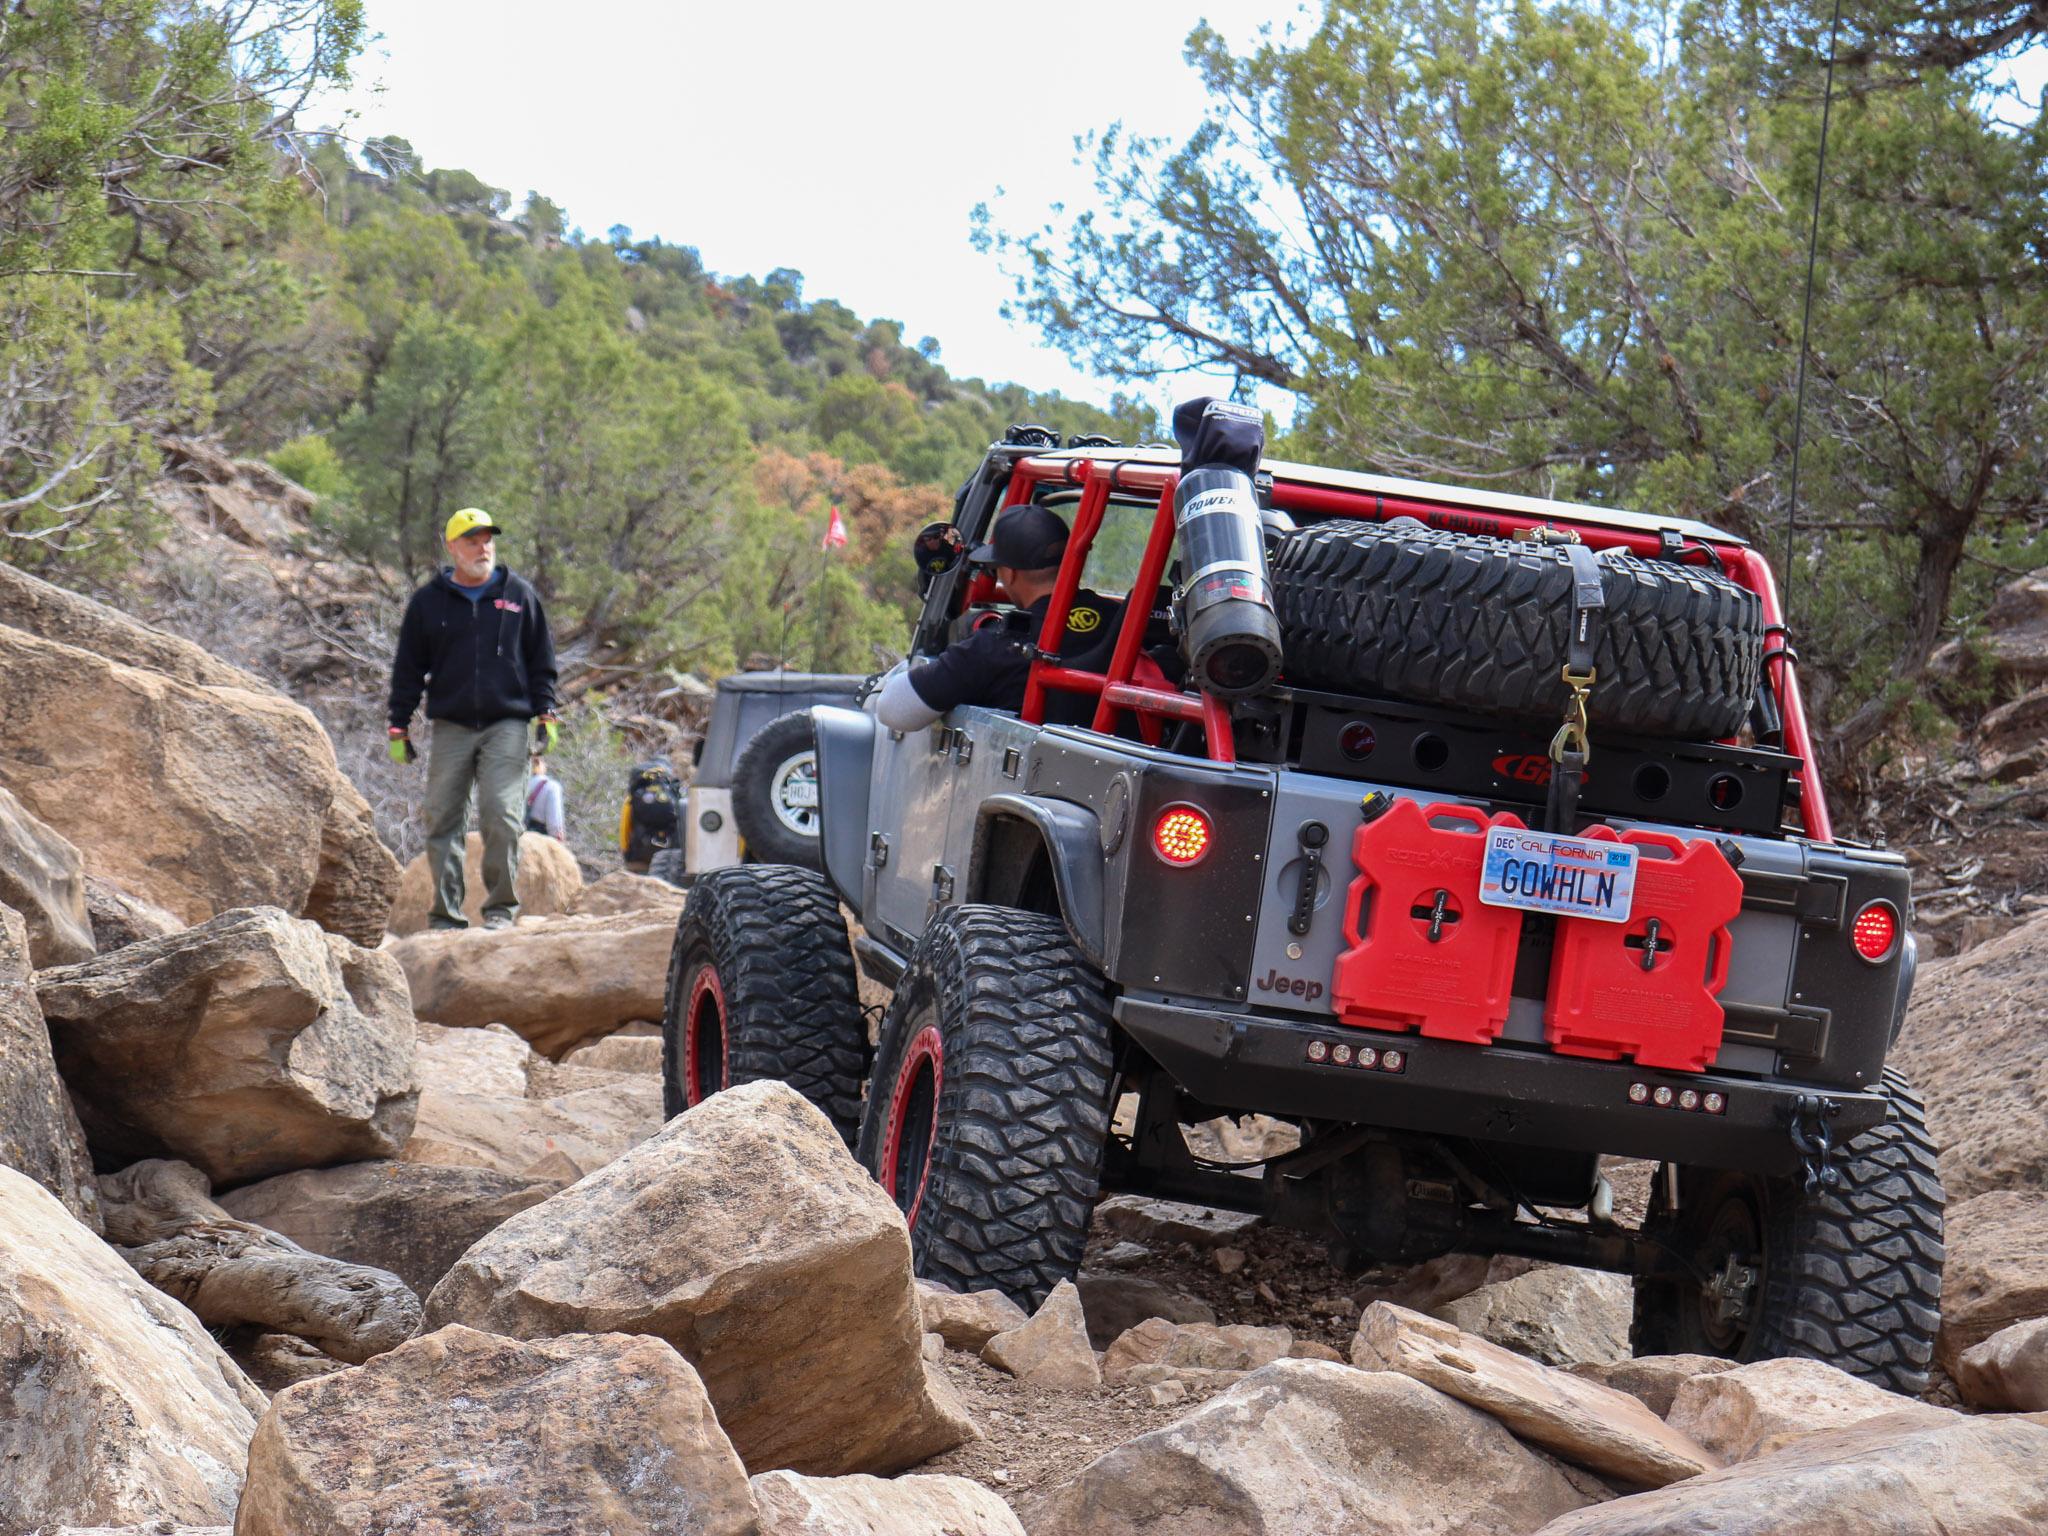 Custom Rock Crawling Jeep JK - Rear View Shot